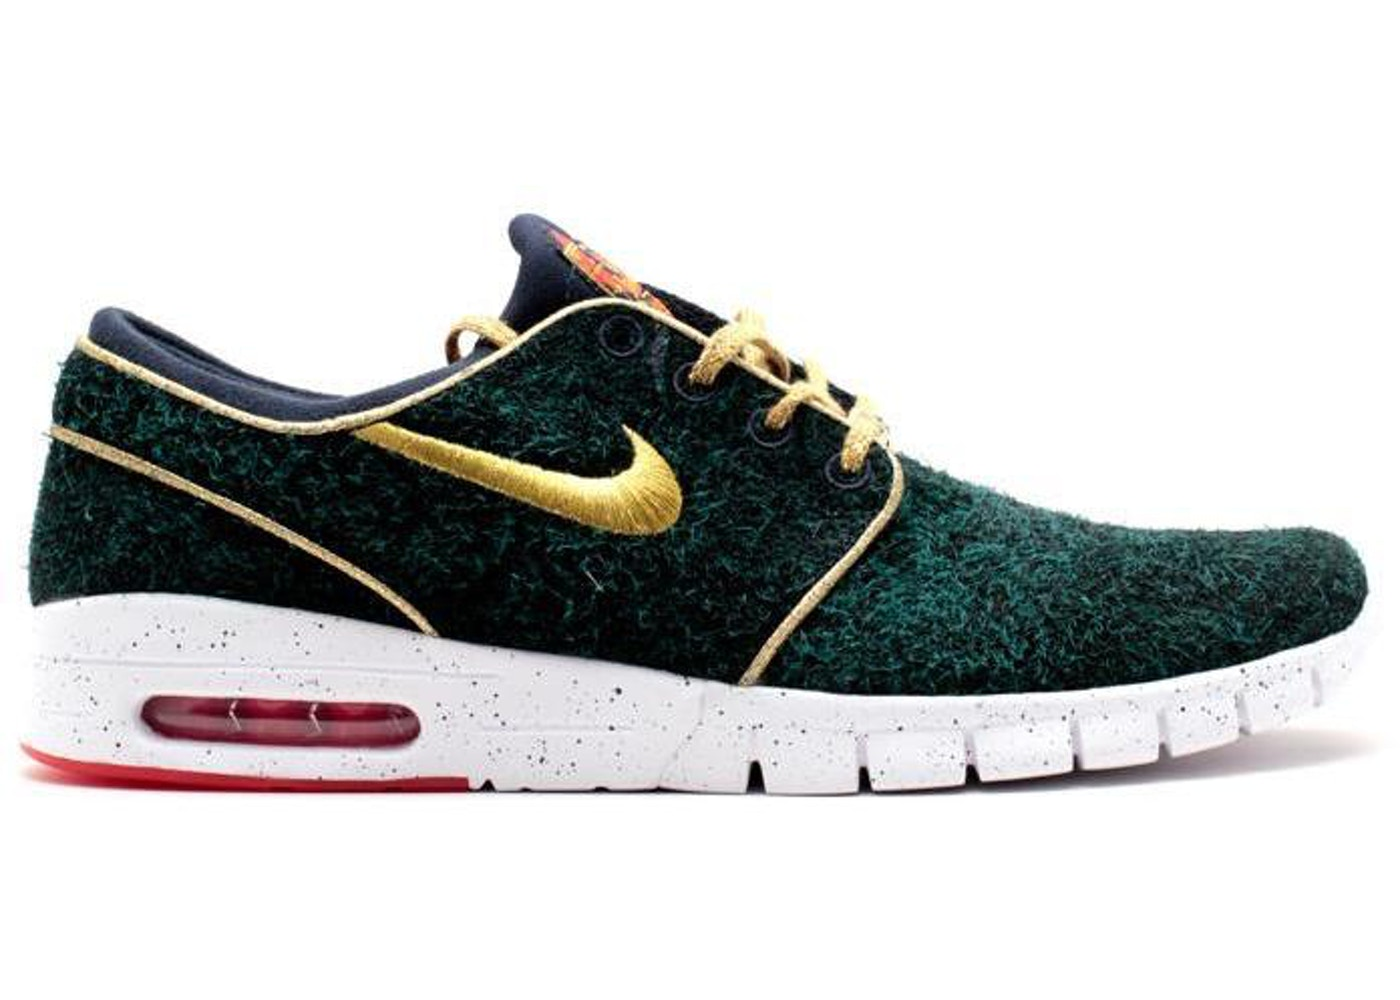 timeless design 4aeeb 40855 Nike SB Janoski Shoes - Release Date